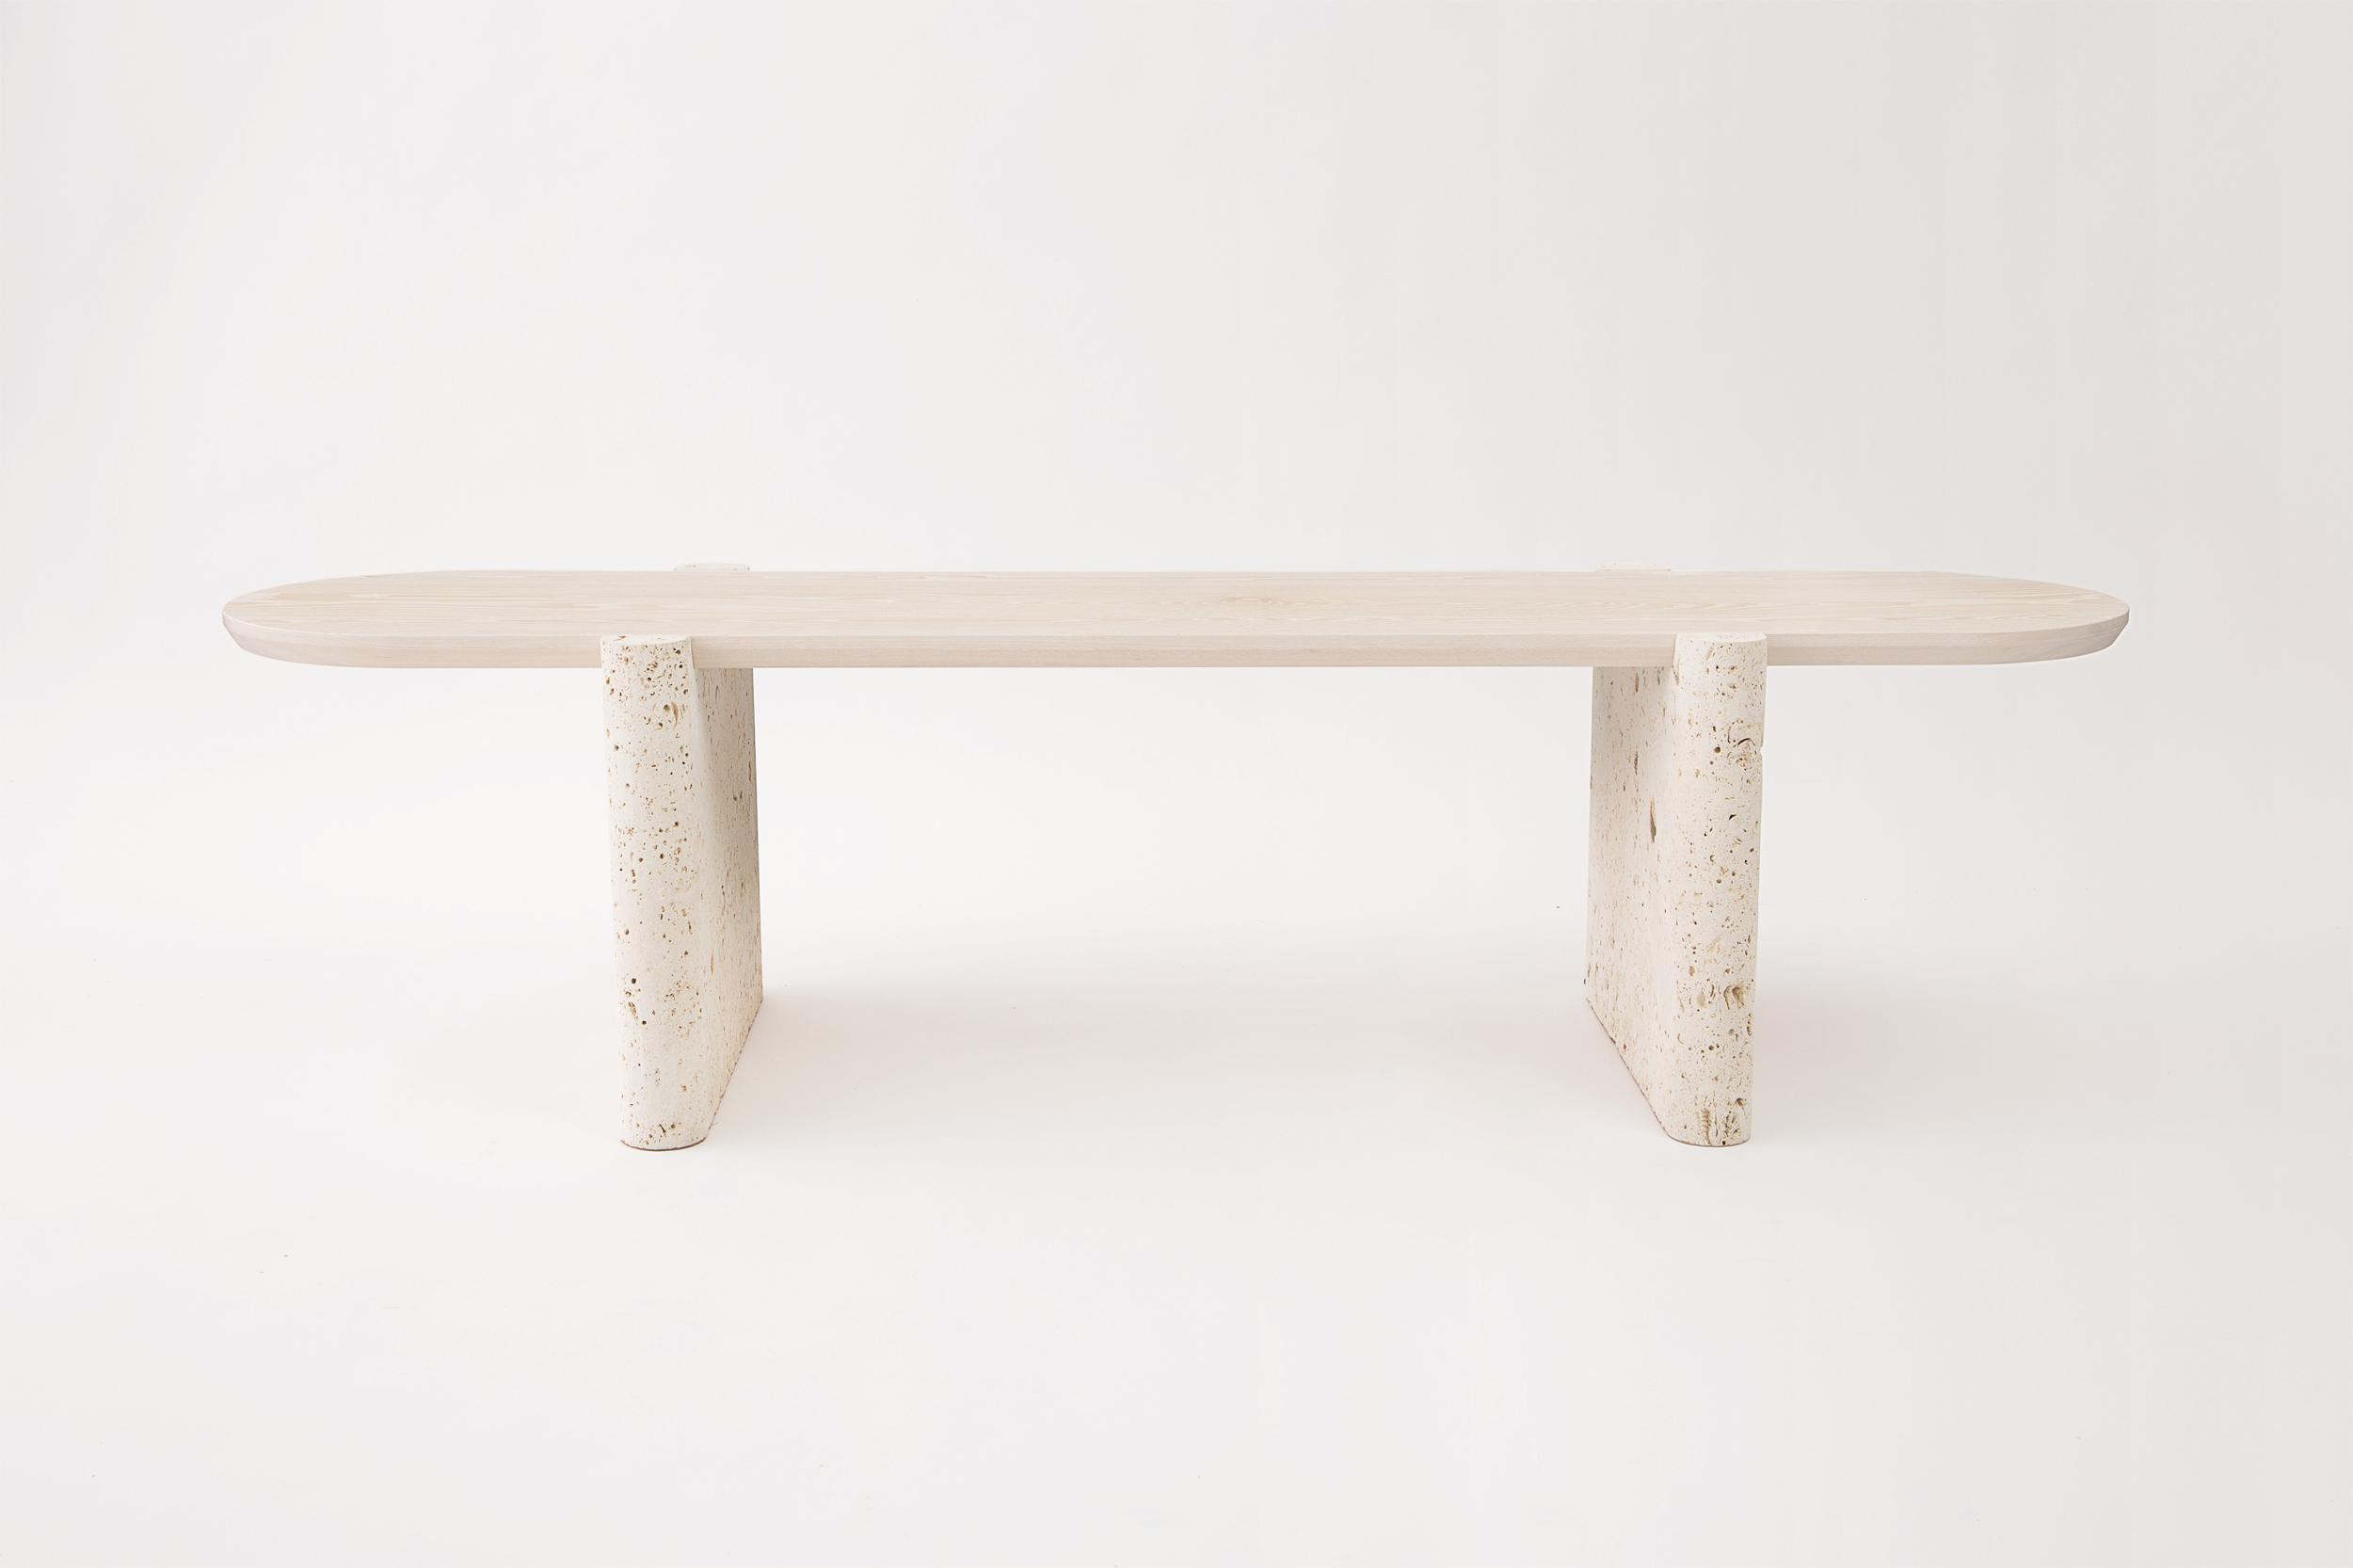 YUCCASTUFF_LAVACA TABLE_VIEW 001.jpg